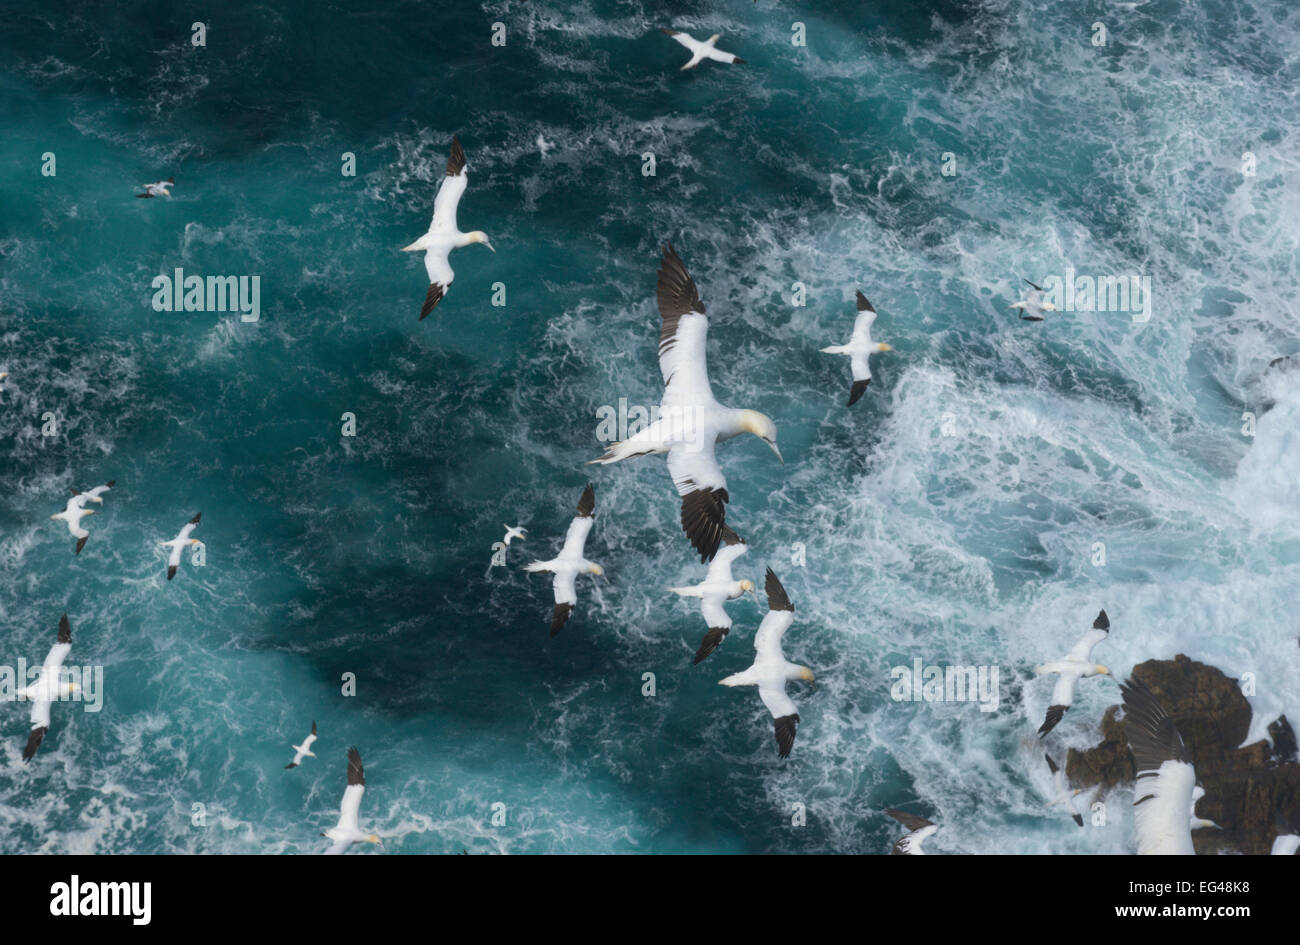 Northern gannets (Morus bassanus) in flight in Force 8 gales above raging seas. Shetland Islands Scotland UK September. Stock Photo